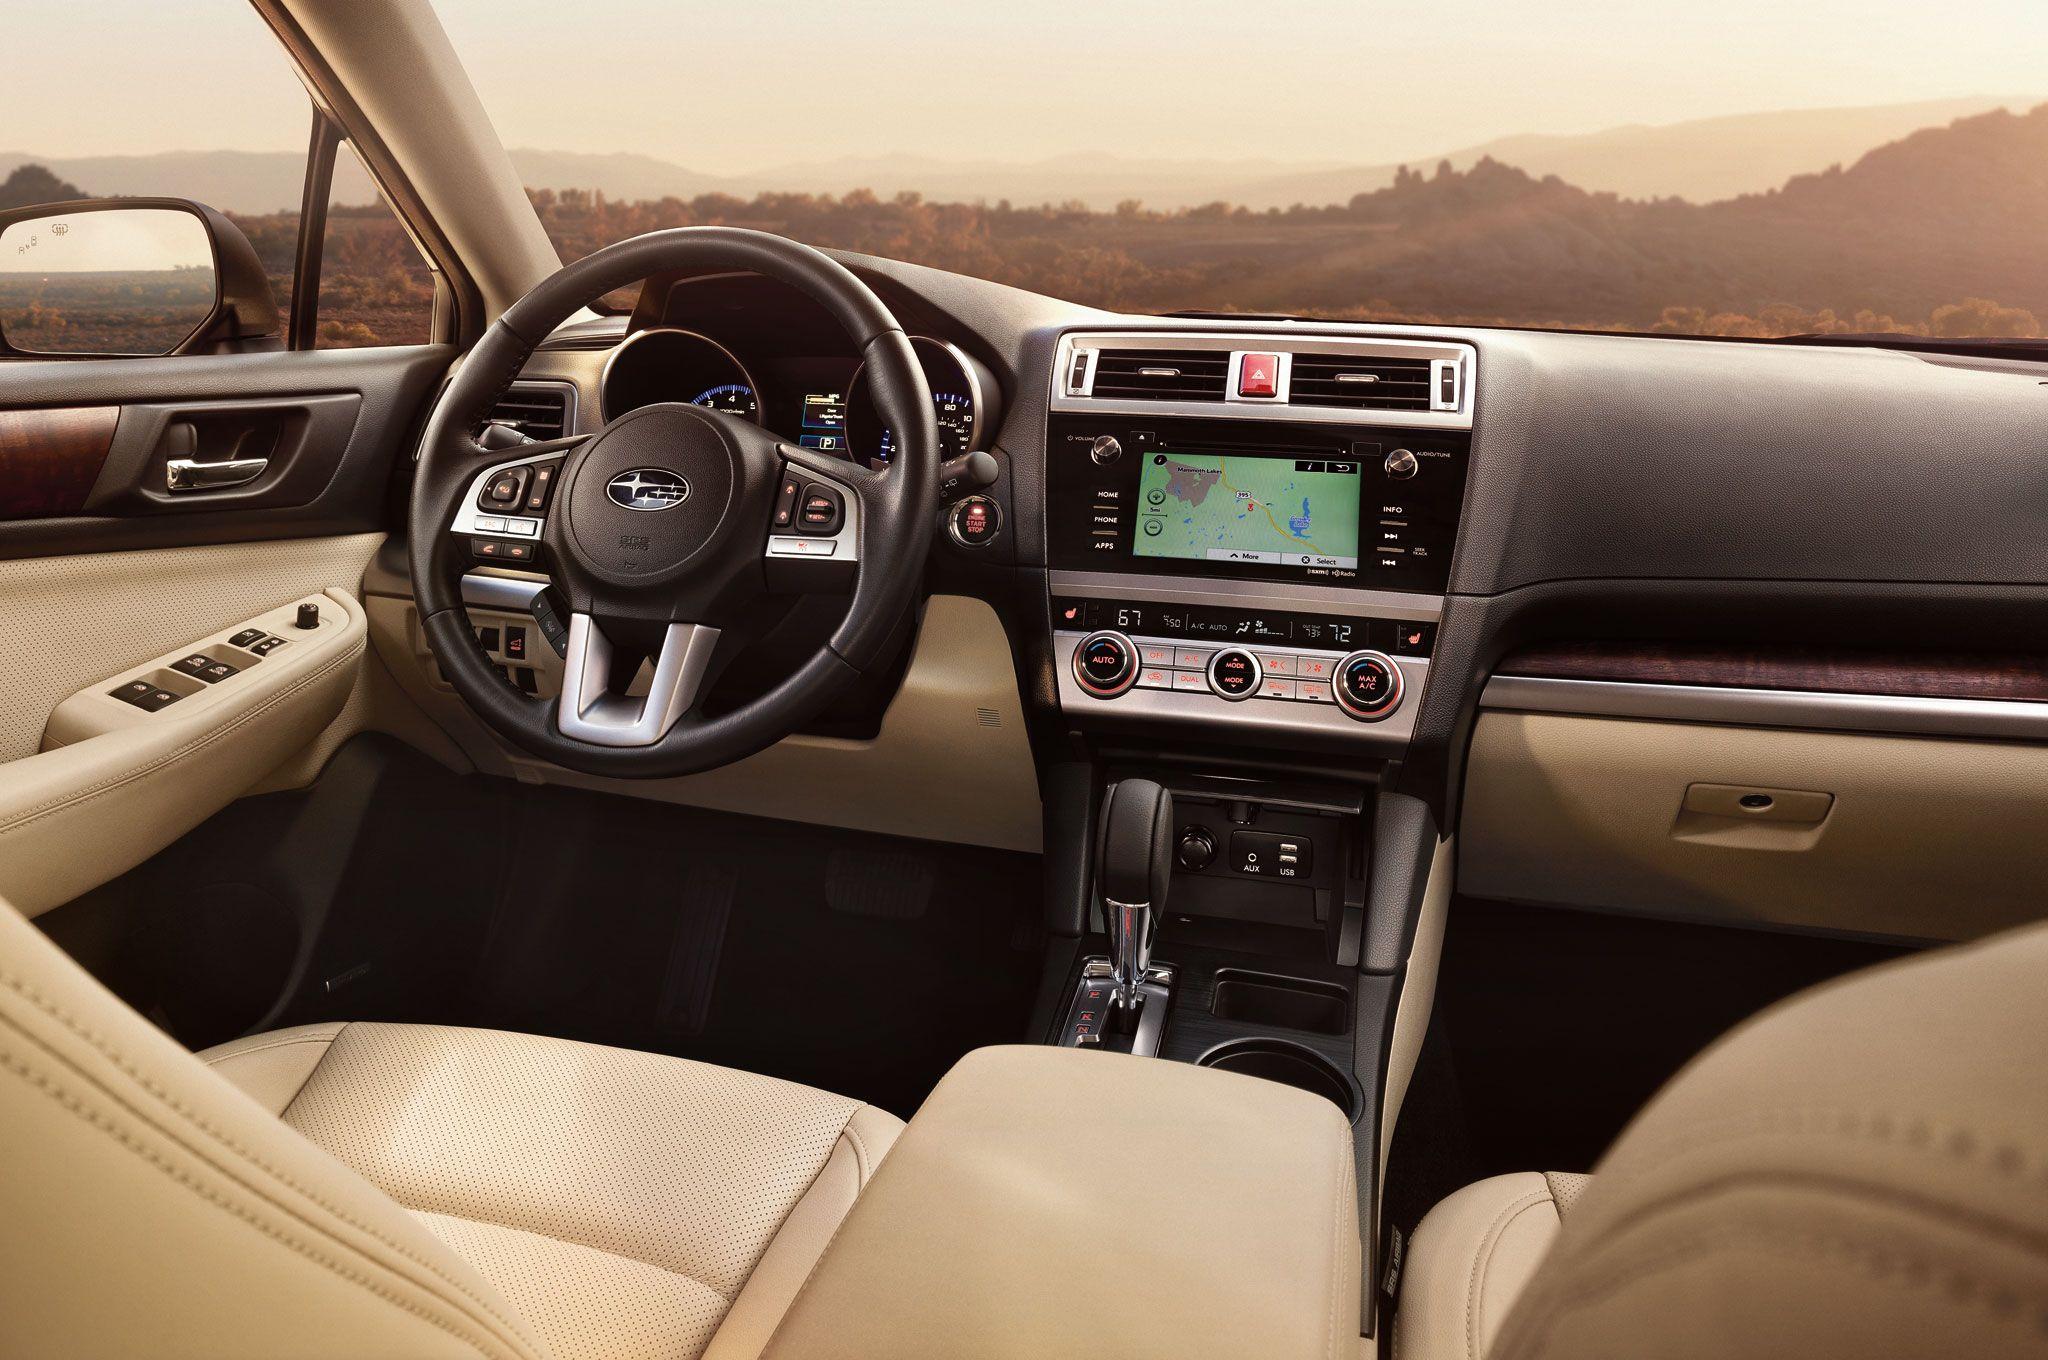 Subaru outback interior illumination kit 2011 2014 vehicle mods subaru outback interior illumination kit 2011 2014 vehicle mods pinterest subaru outback subaru and cars vanachro Gallery